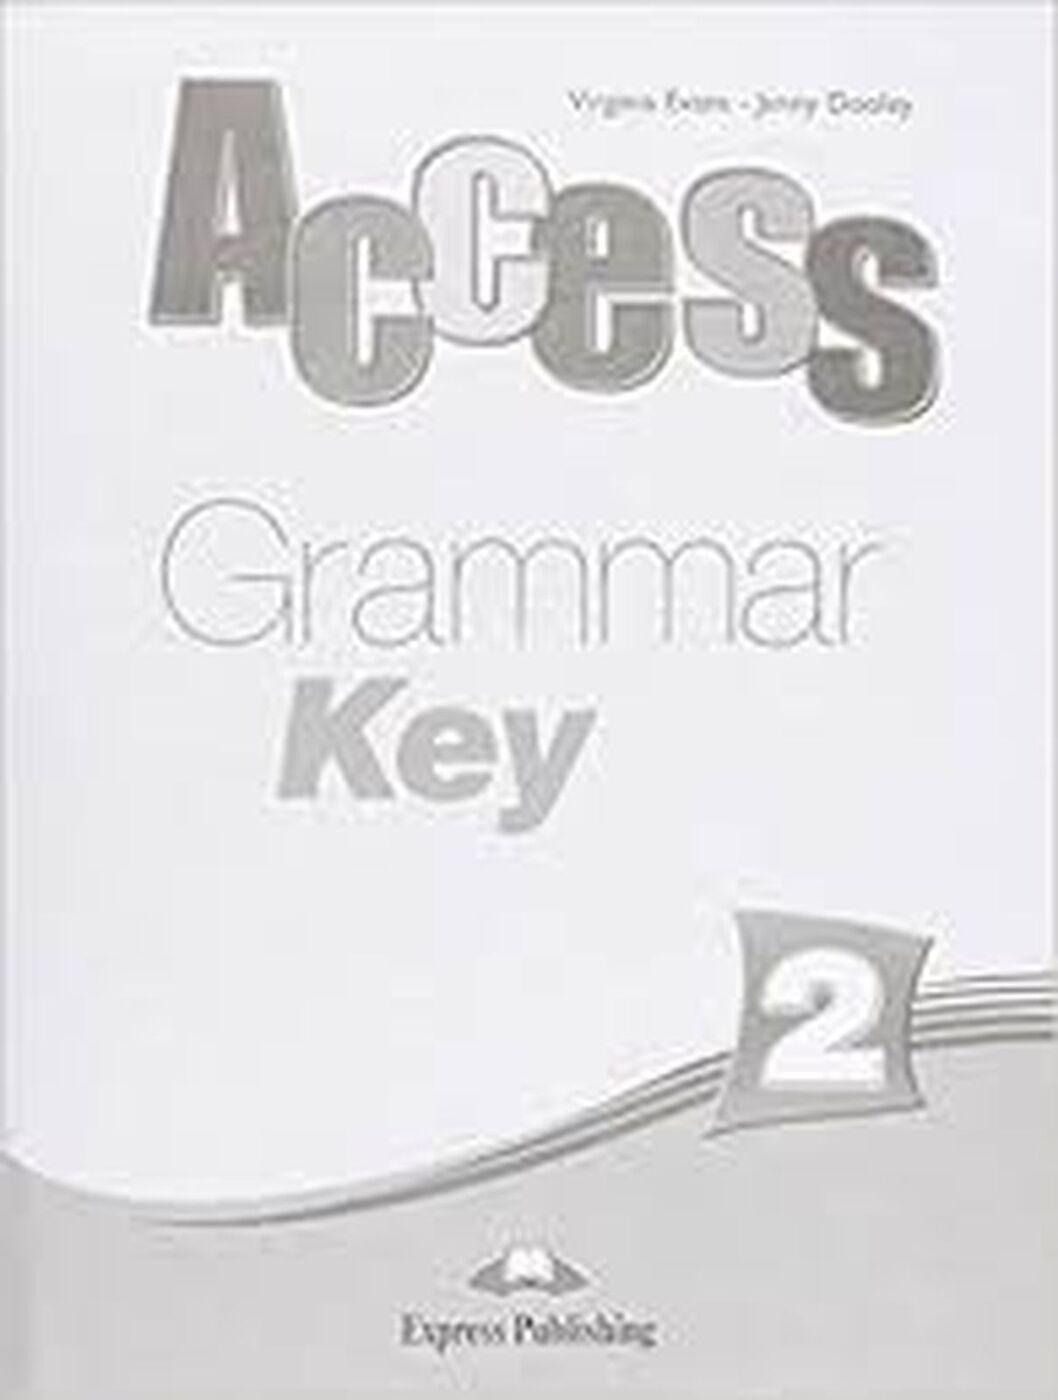 Virginia Evans, Jenny Dooley. Access 2: Grammar Key | Эванс Вирджиния, Дули Дженни